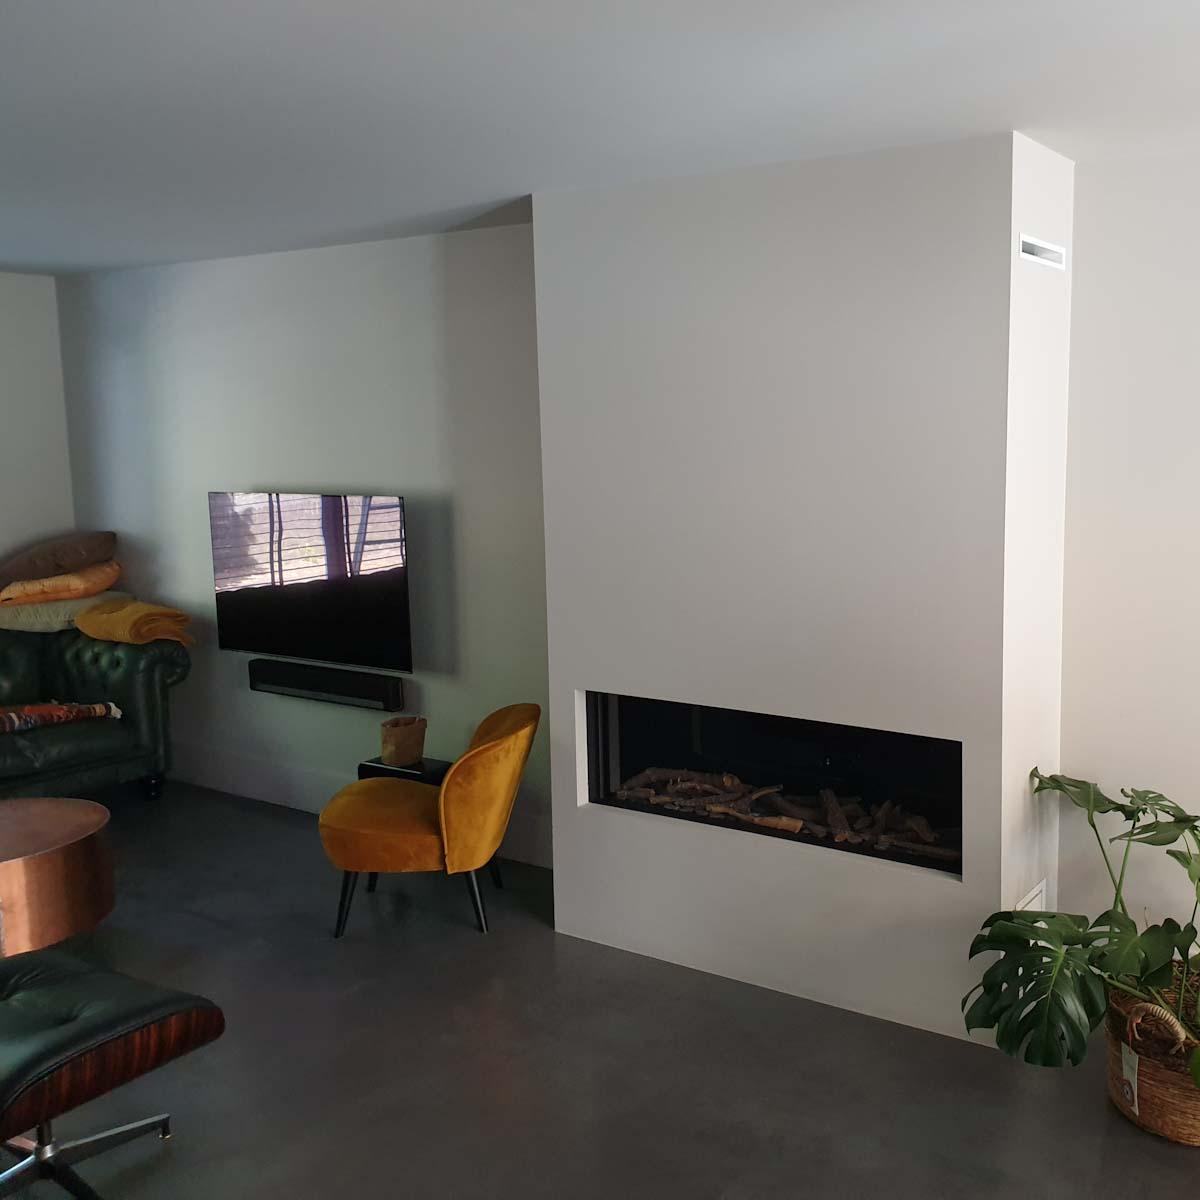 Faber Relaxed Premium XL Artfire Openhaarden